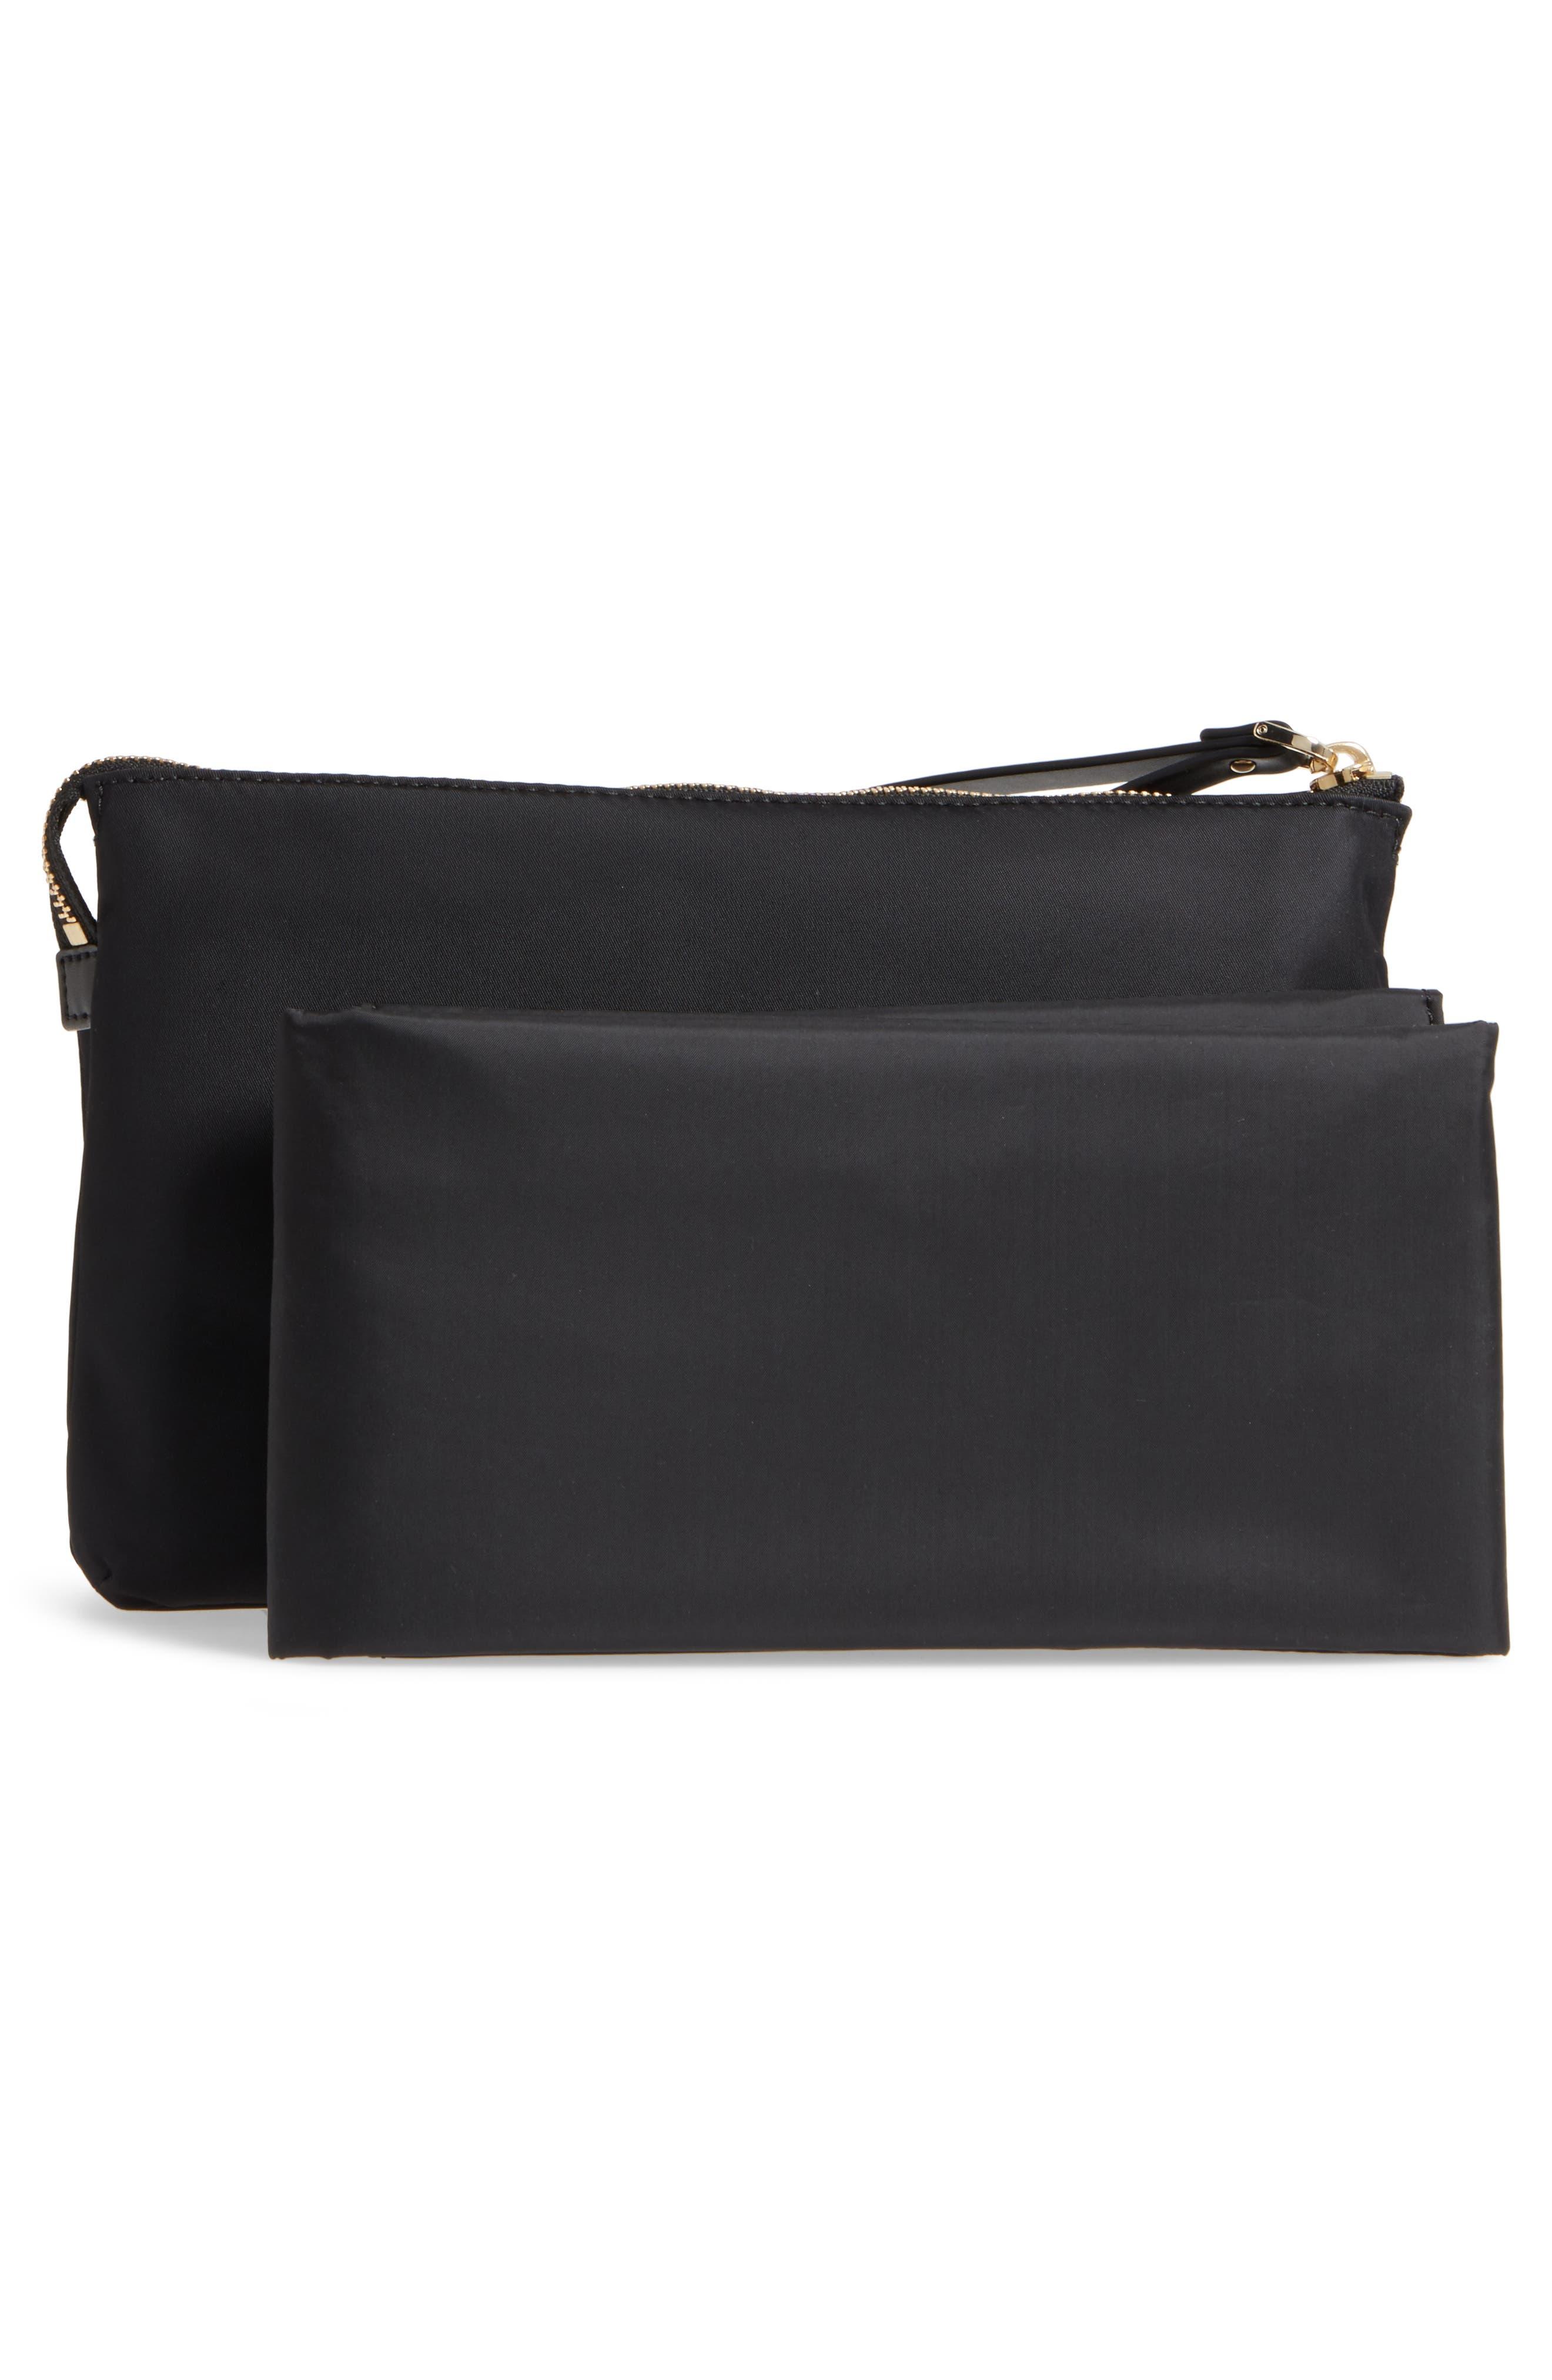 watson lane winnie baby nylon pouch with changing mat,                             Alternate thumbnail 3, color,                             Black